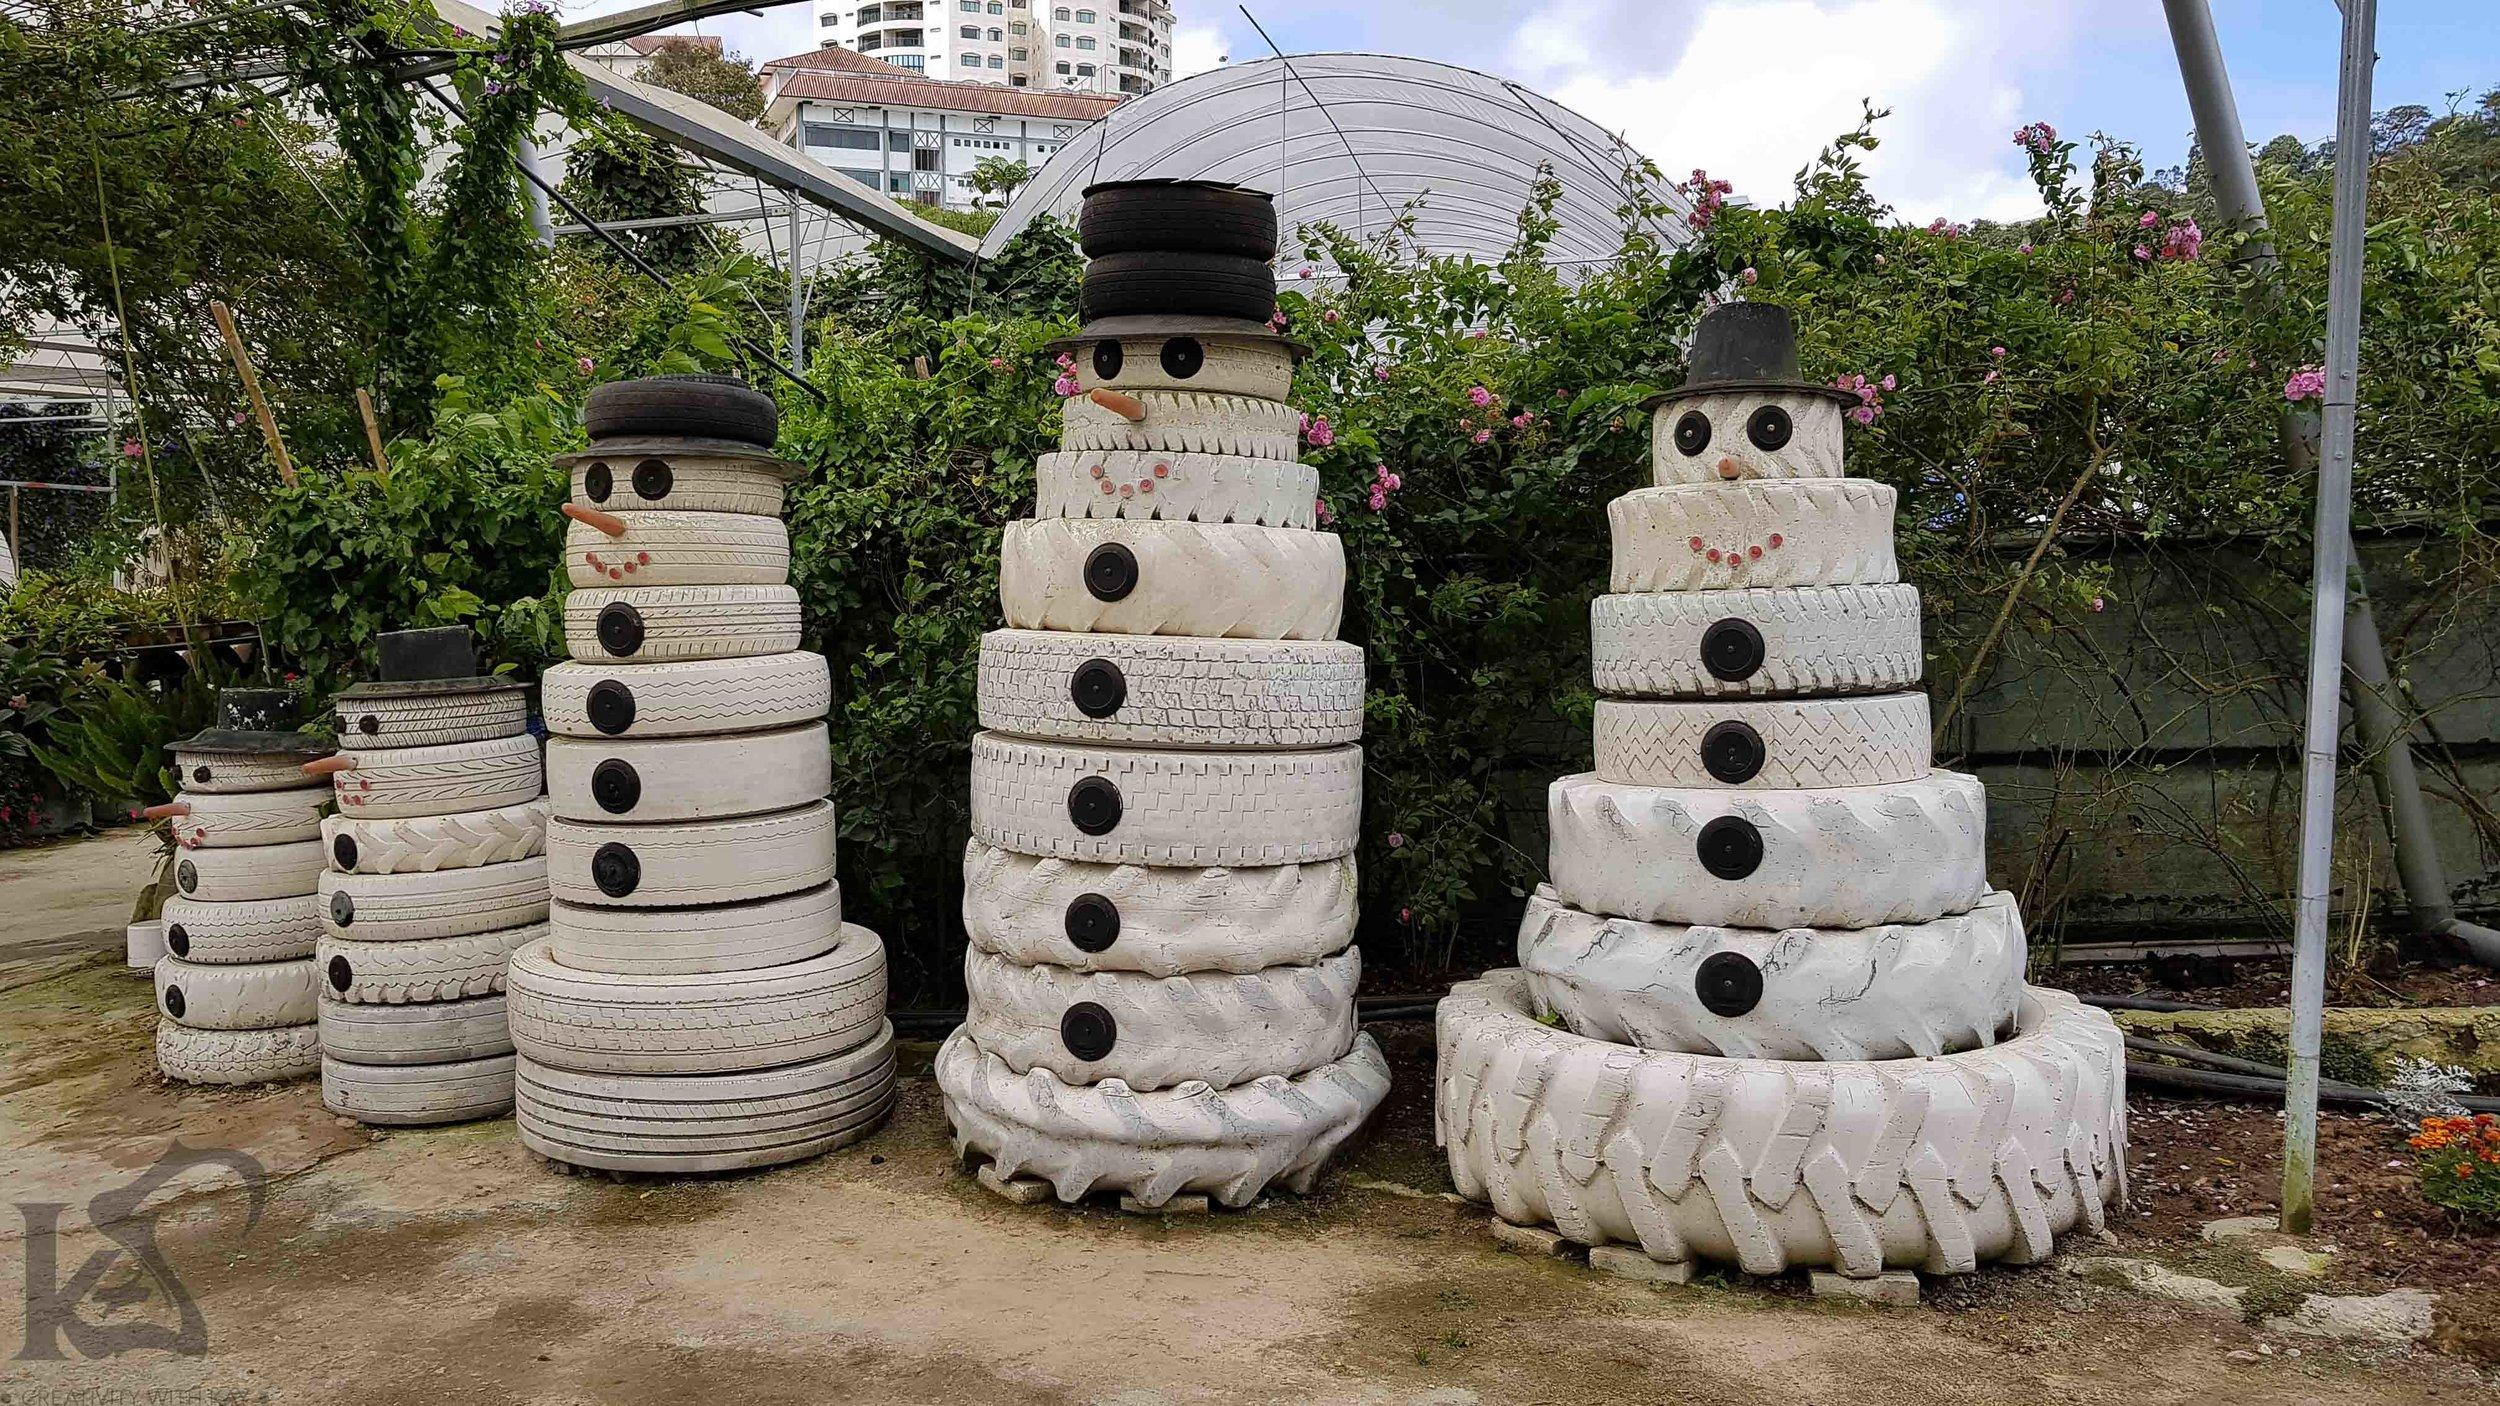 cameronhighlands-malaysia-qatarblogger-junglewalk-112141.jpg